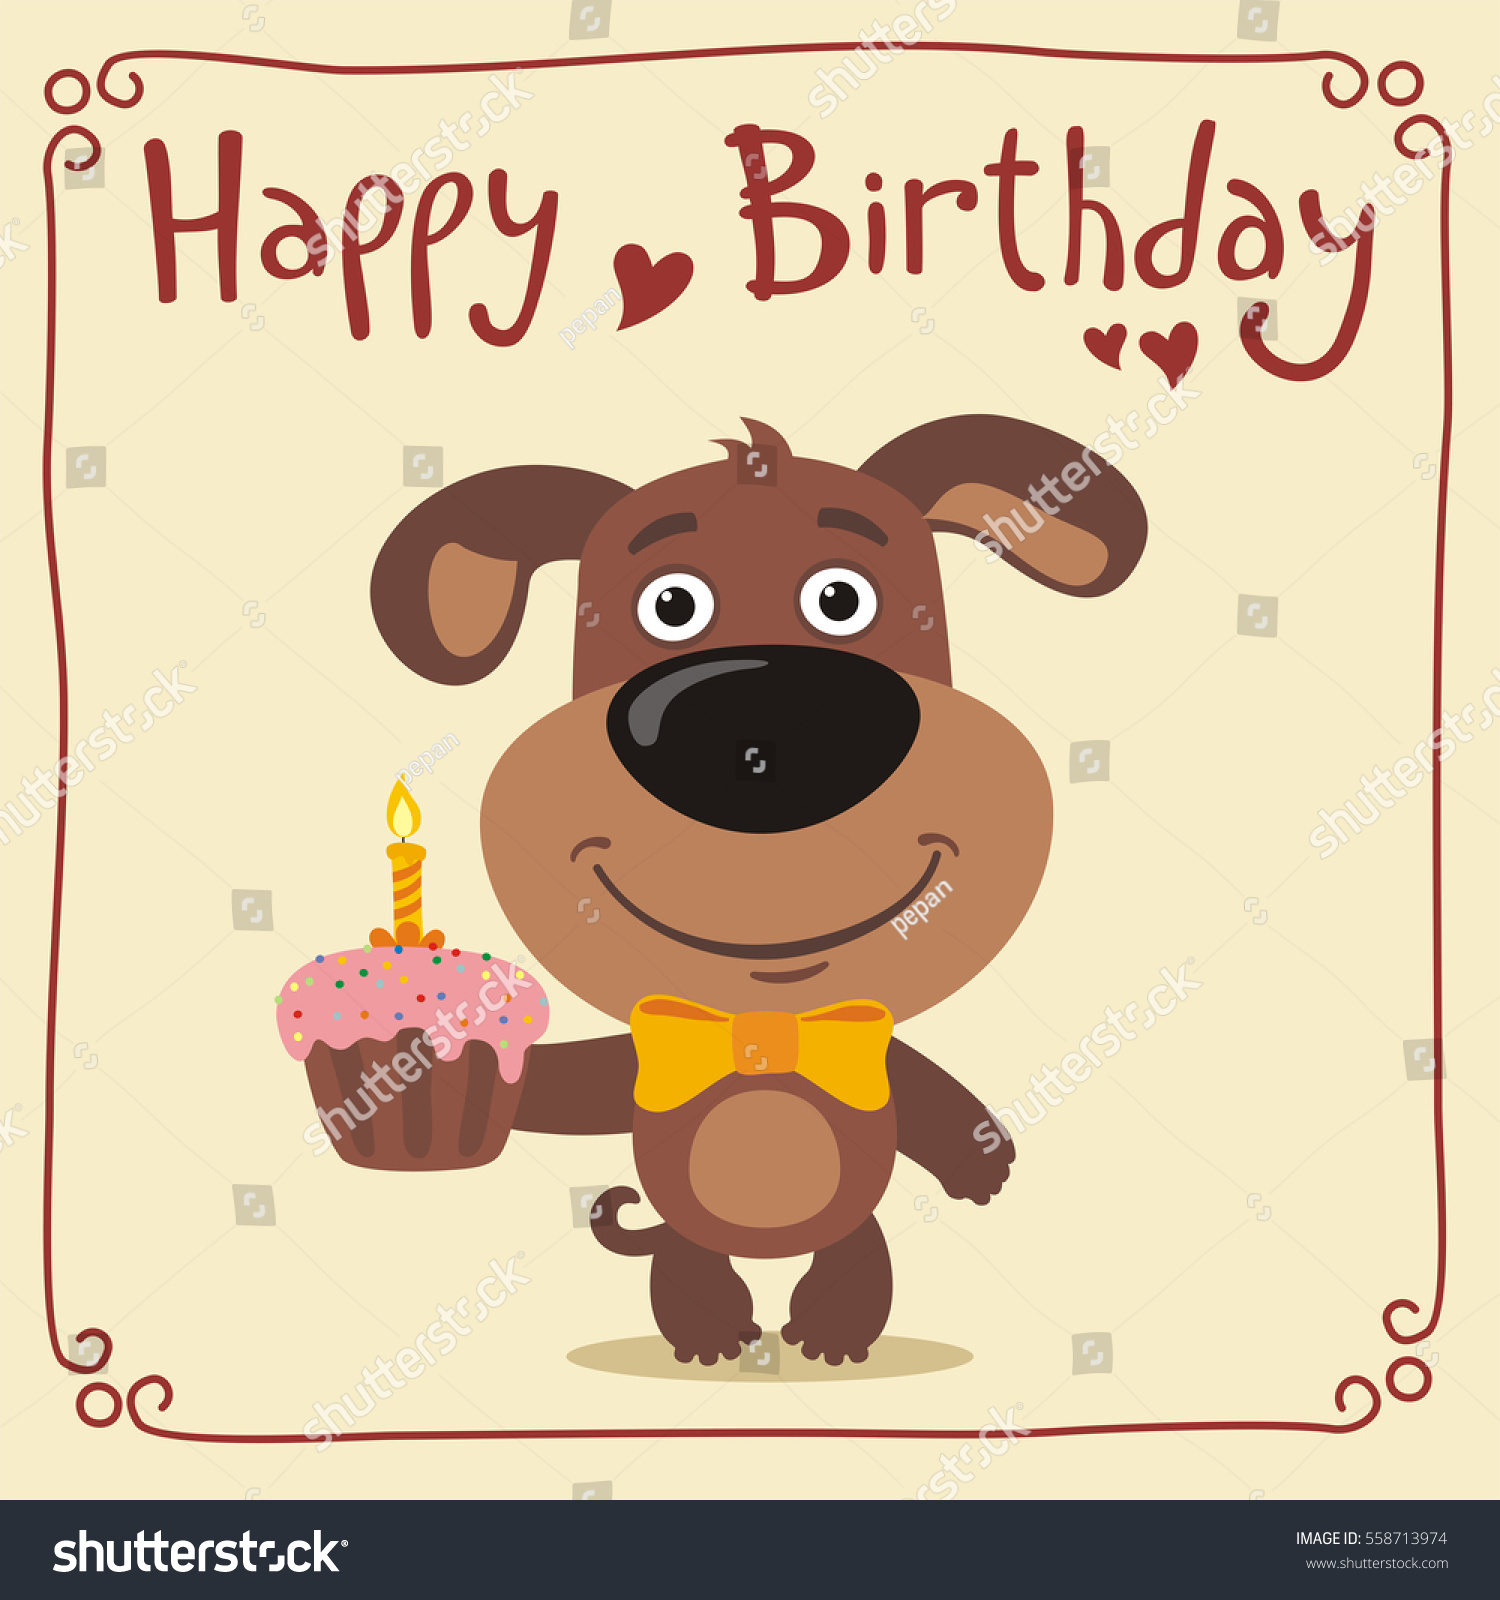 Happy Birthday Funny Puppy Dog Cake Stock Vector Royalty Free